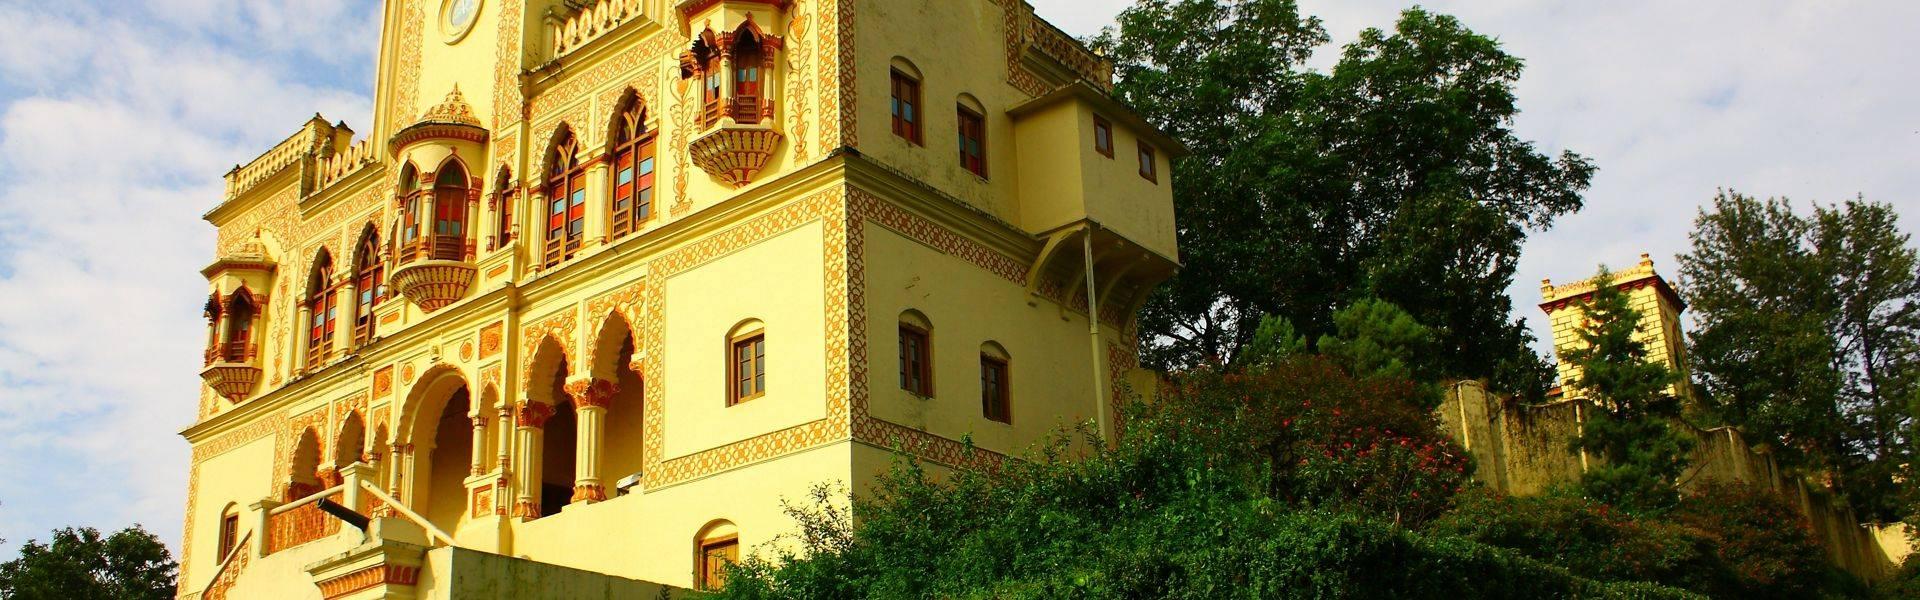 Ananda-palace-exterior.jpg